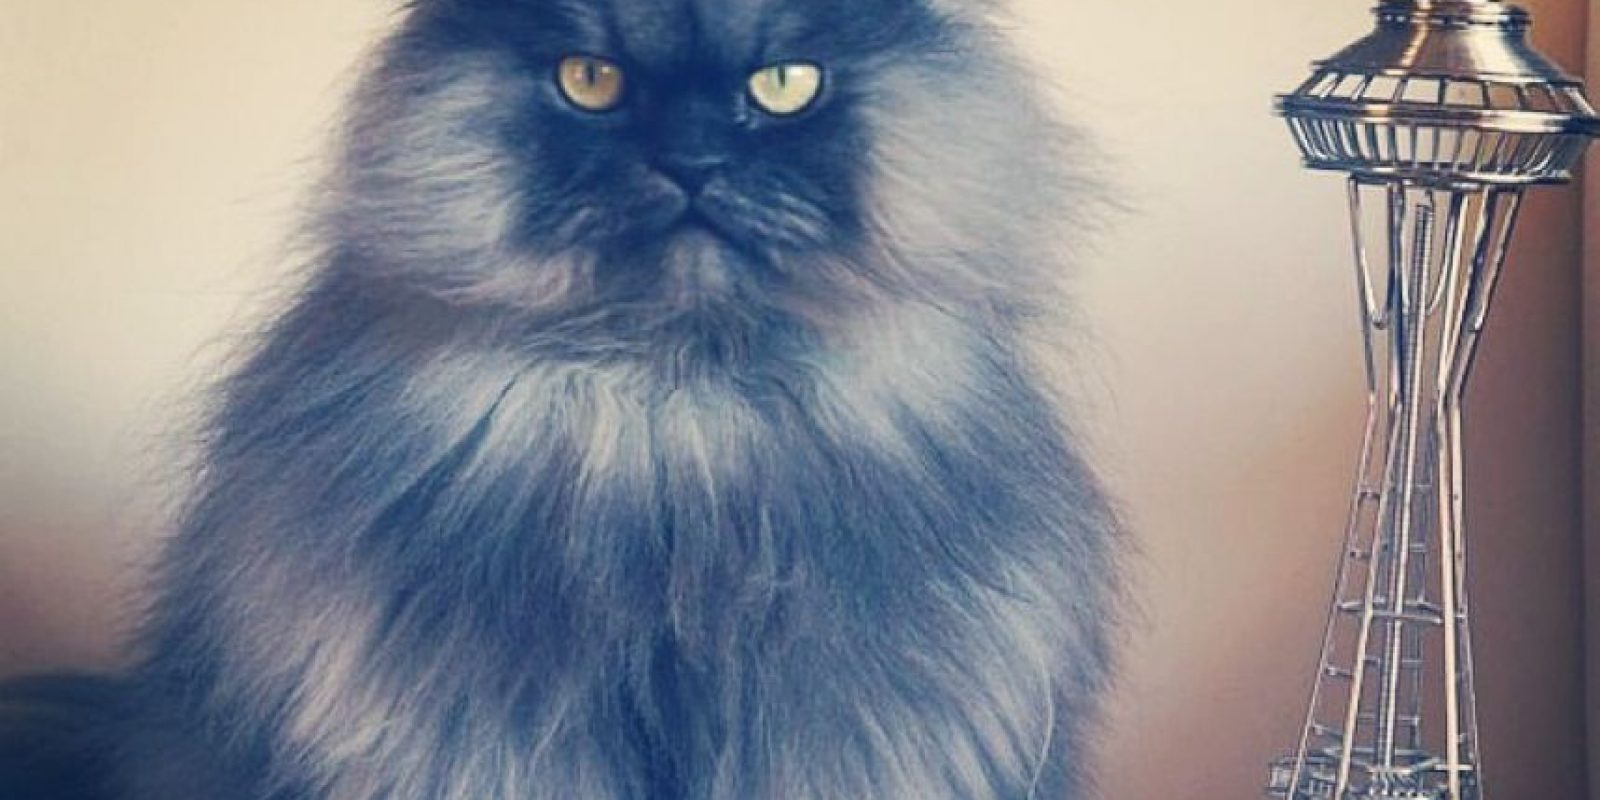 Colonel Meow Foto:Facebook